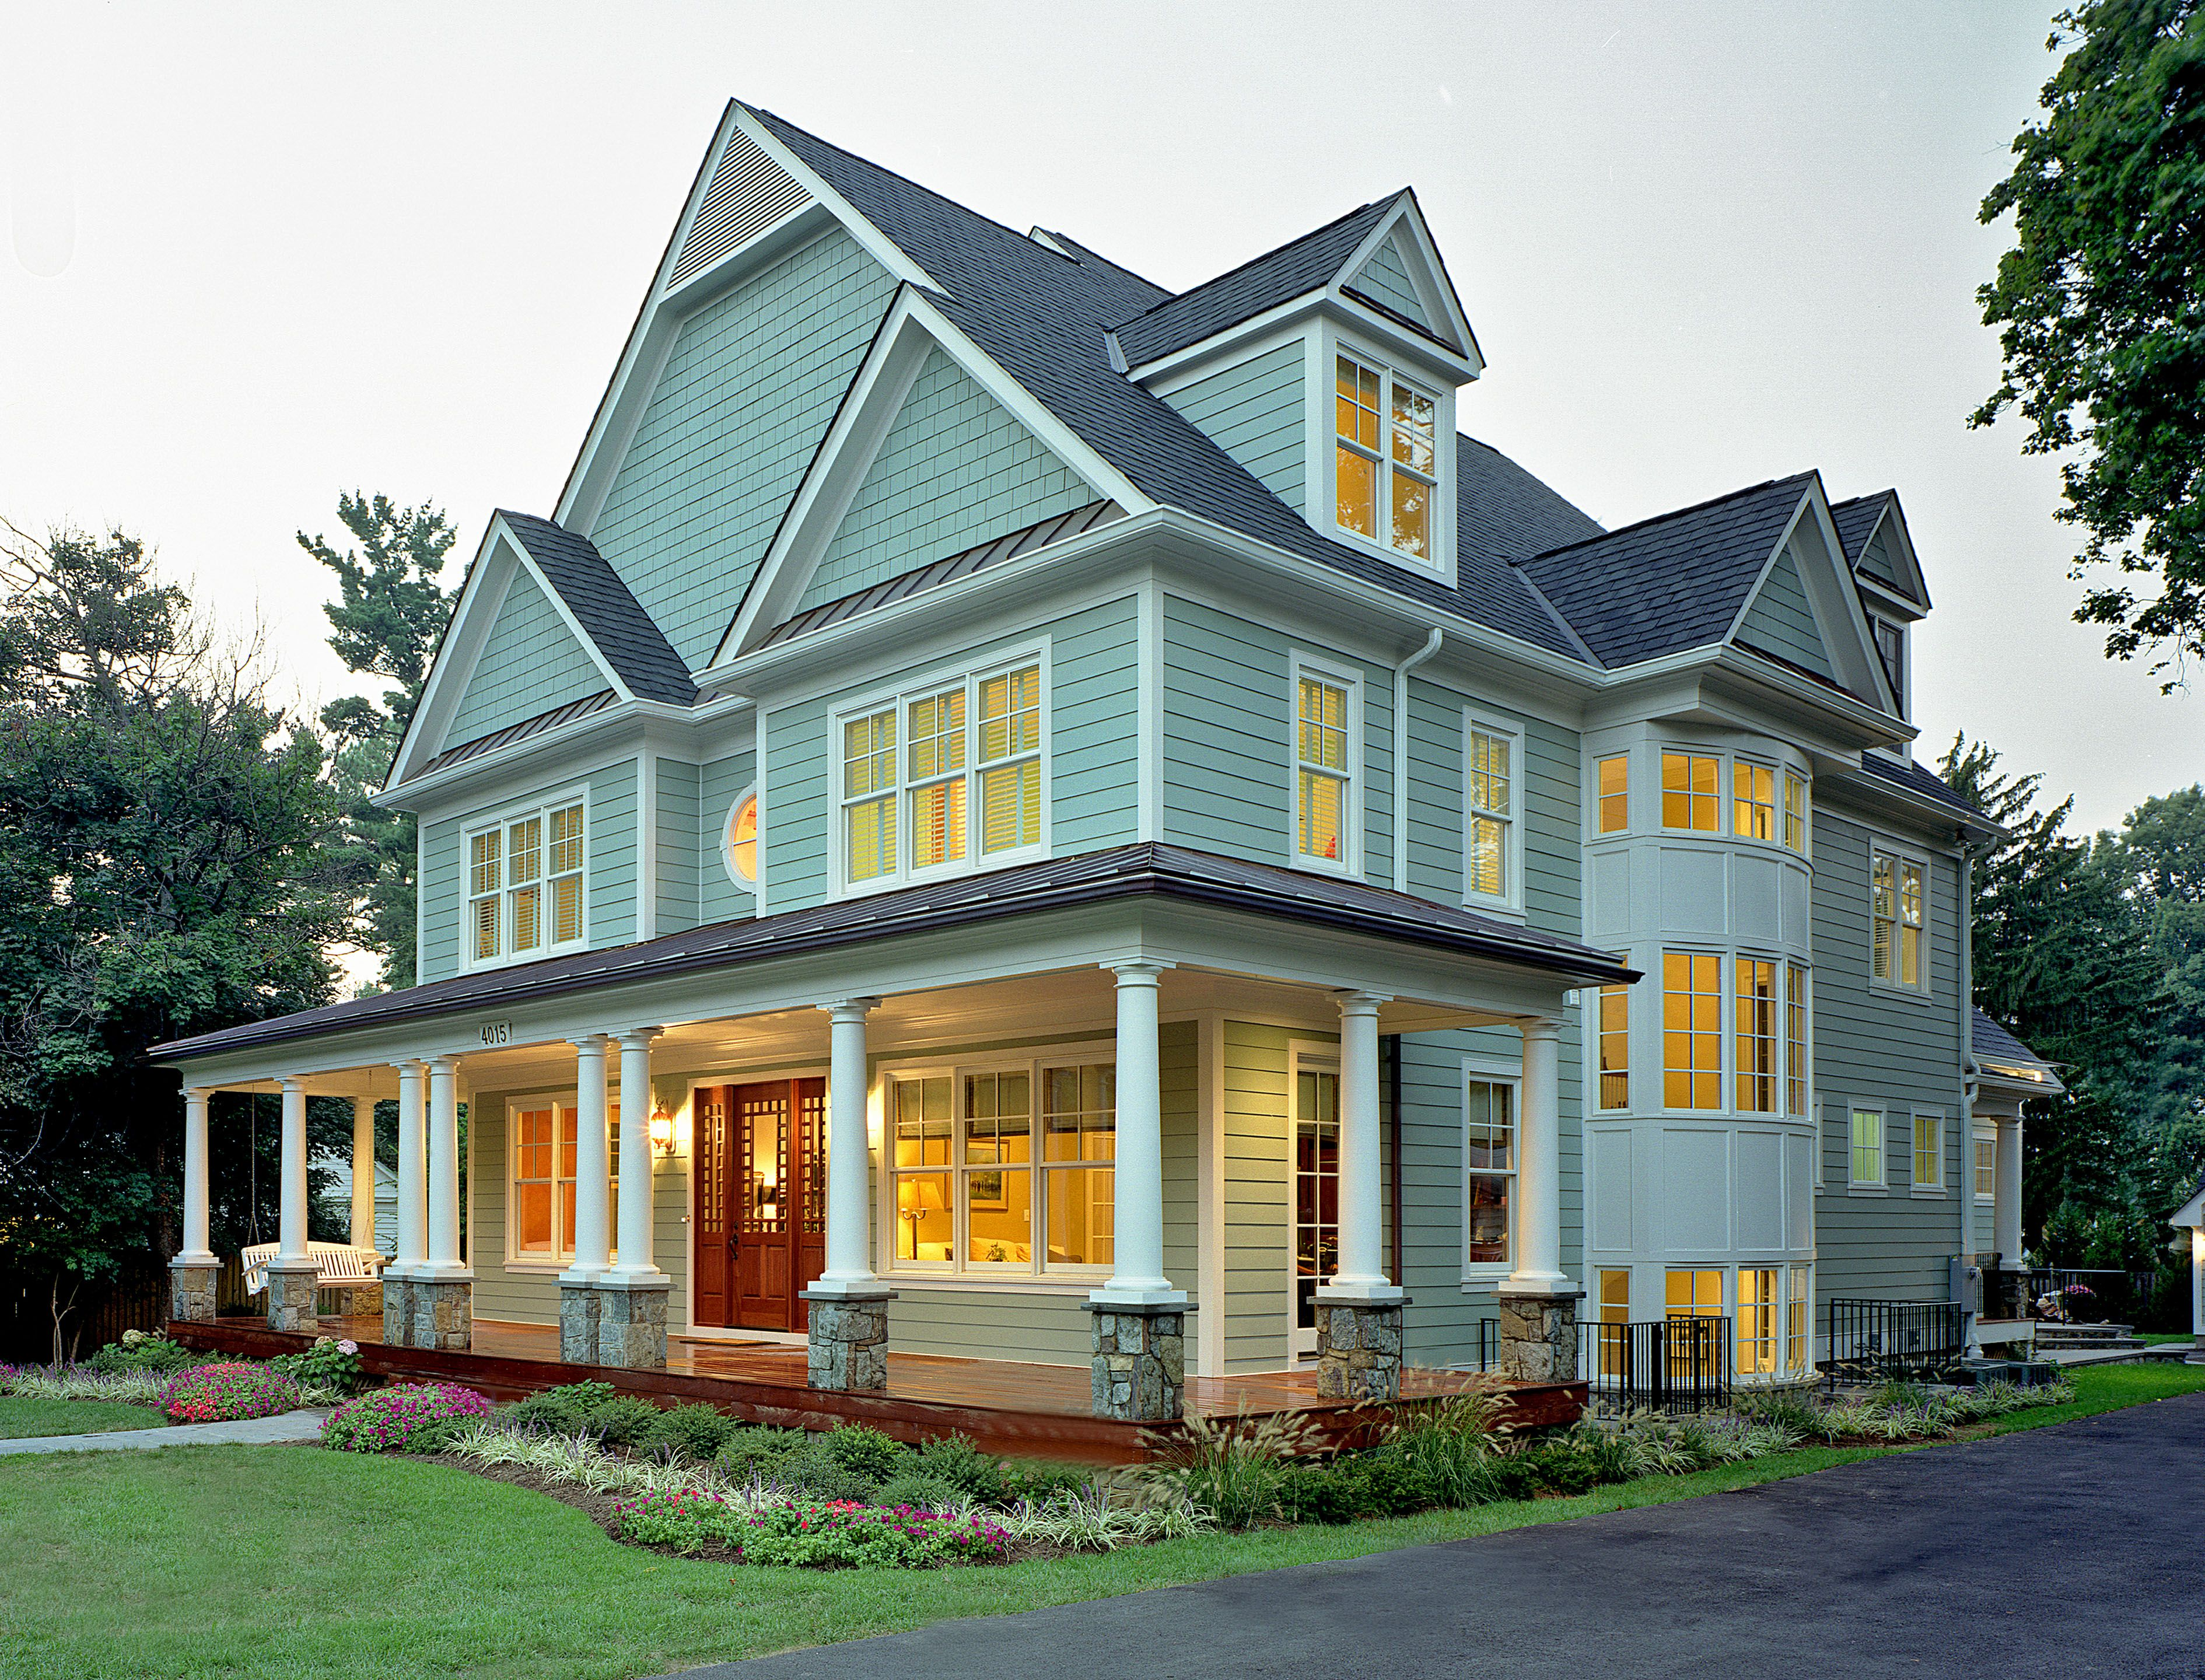 25 Great Farmhouse Exterior Design Ideas | Modern ...